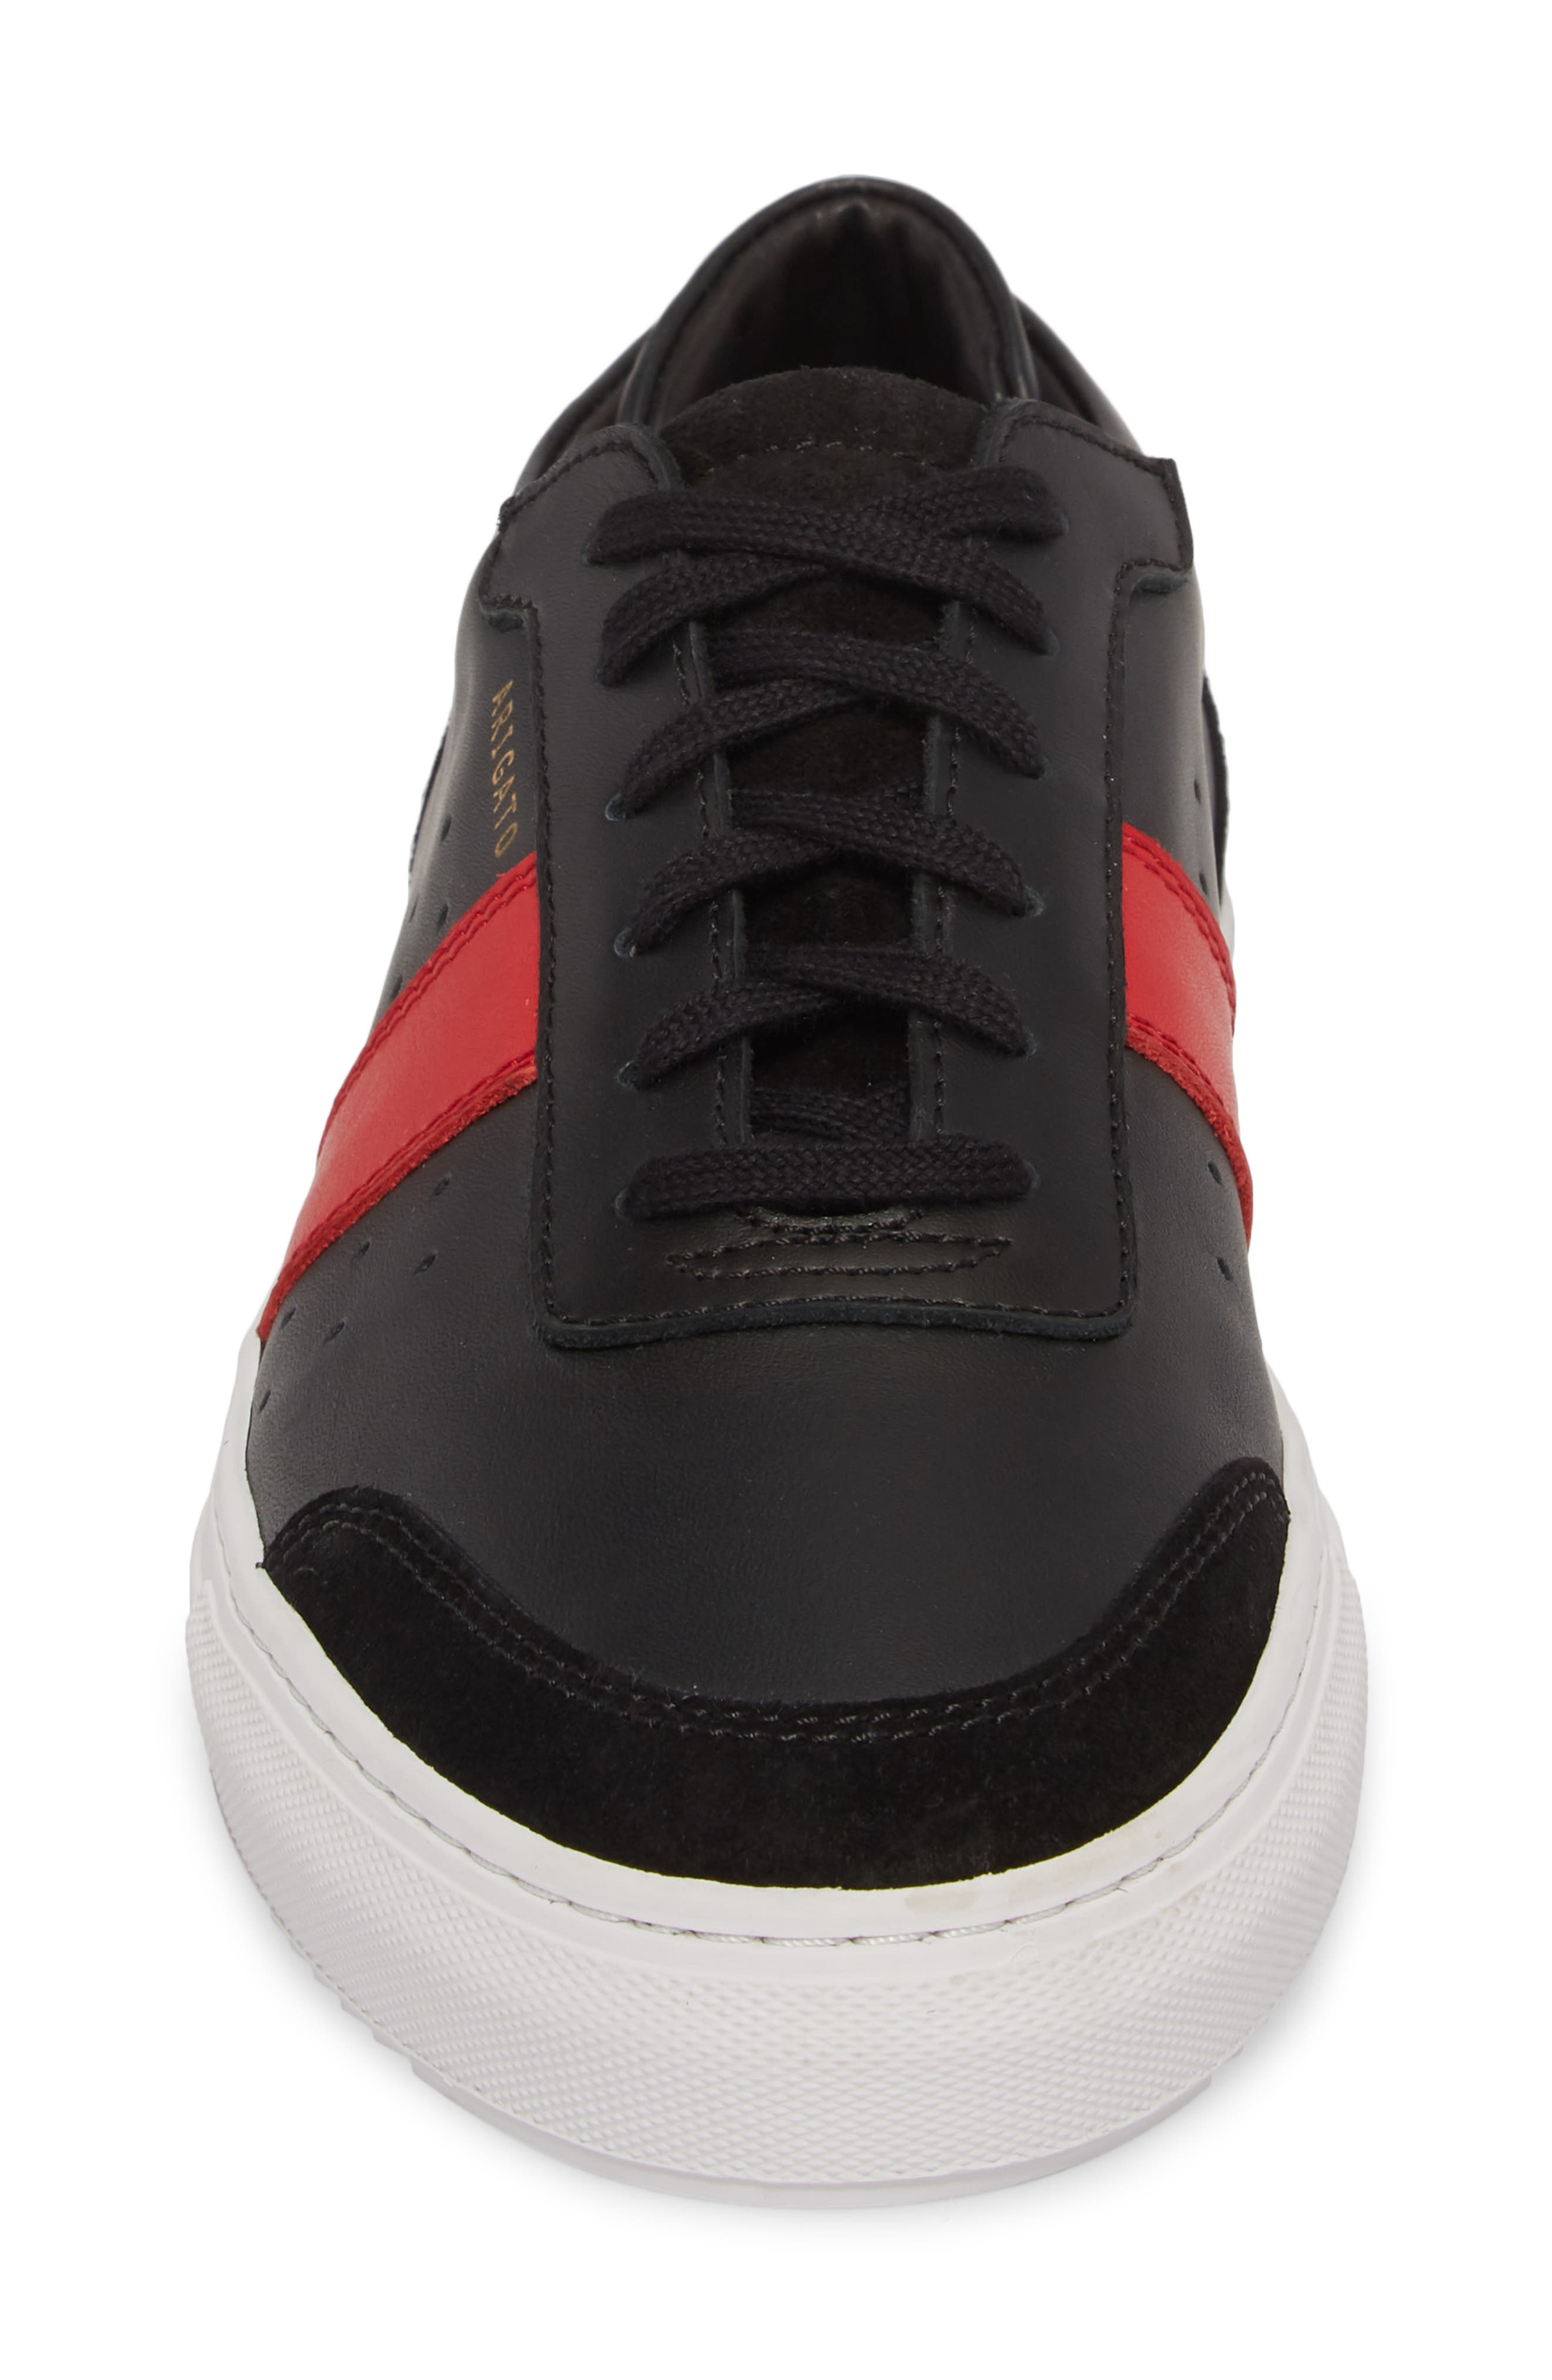 Dunk Sneaker,                             Alternate thumbnail 4, color,                             BLACK/ BLACK